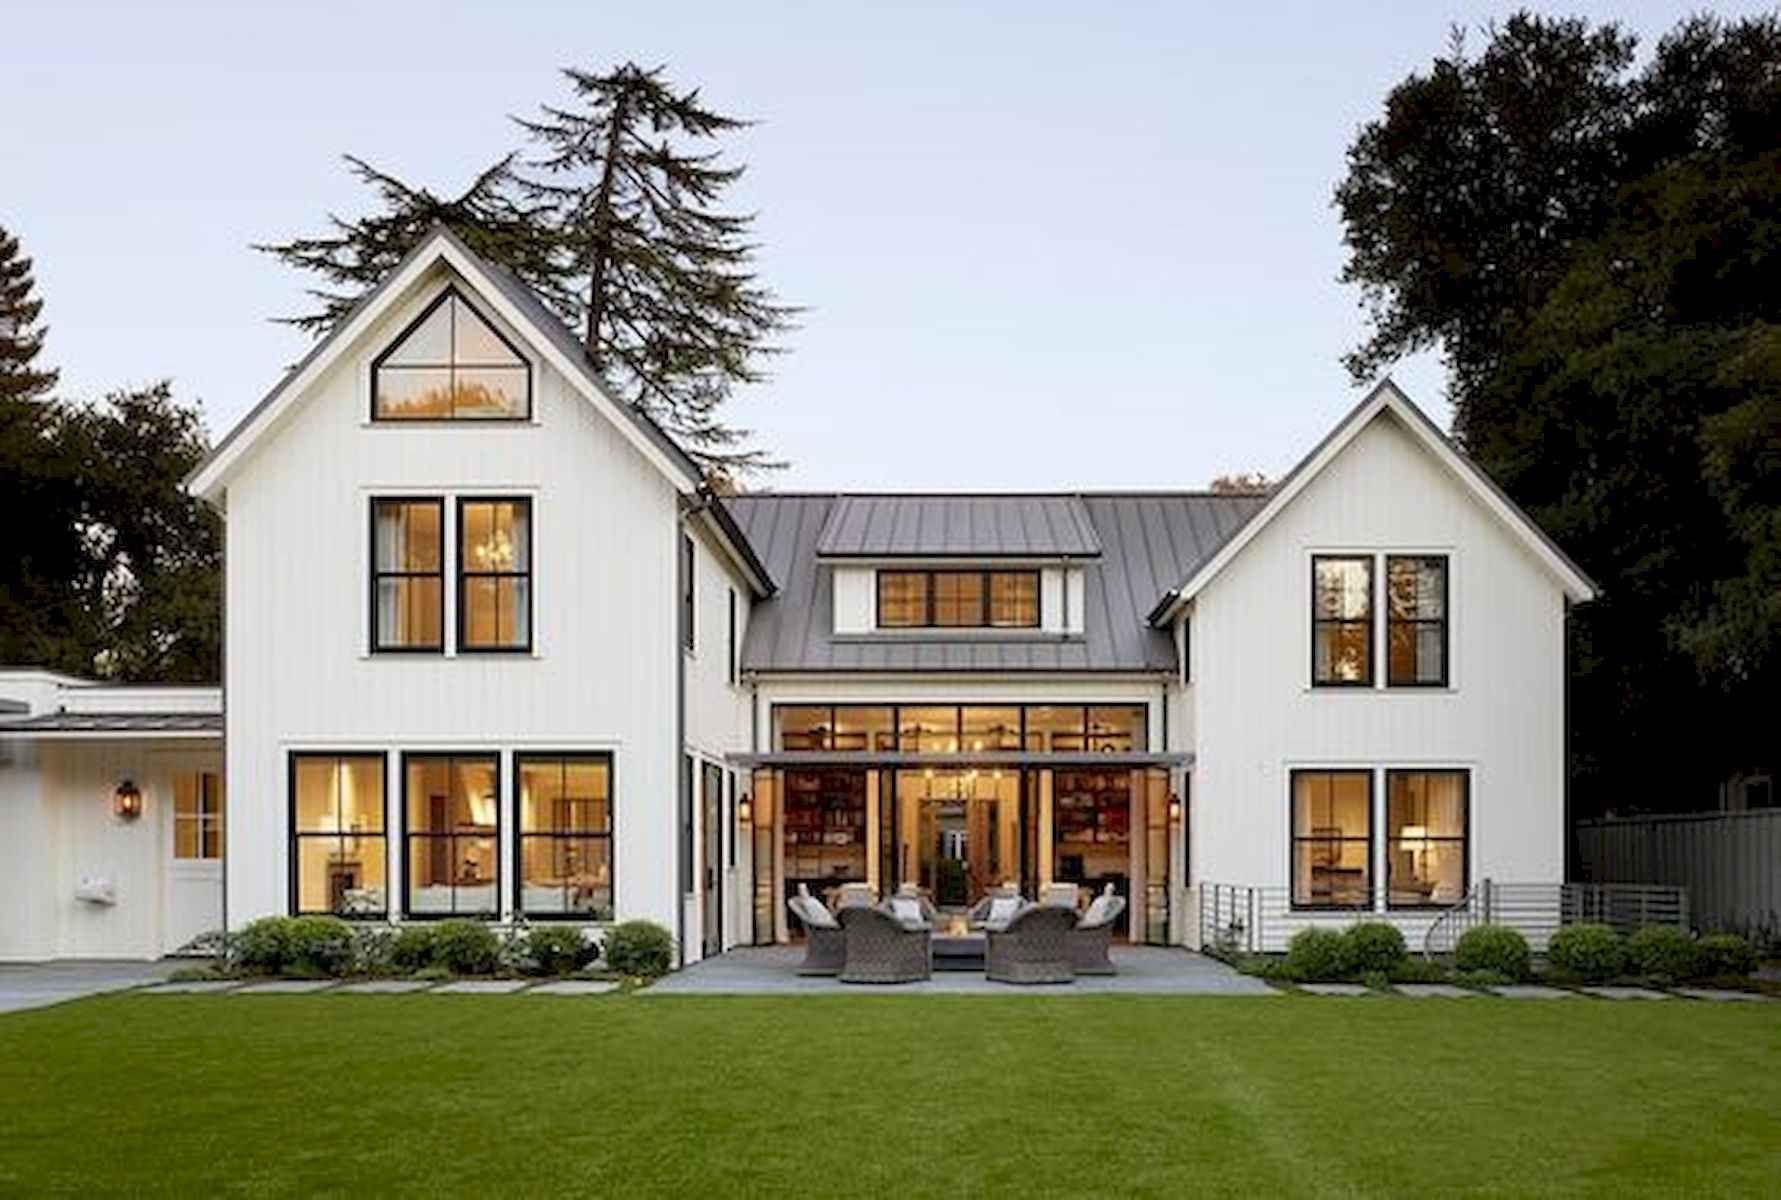 33 Best Modern Farmhouse Exterior Design Ideas 19 Modern Farmhouse Exterior Dream House Exterior Farmhouse Exterior